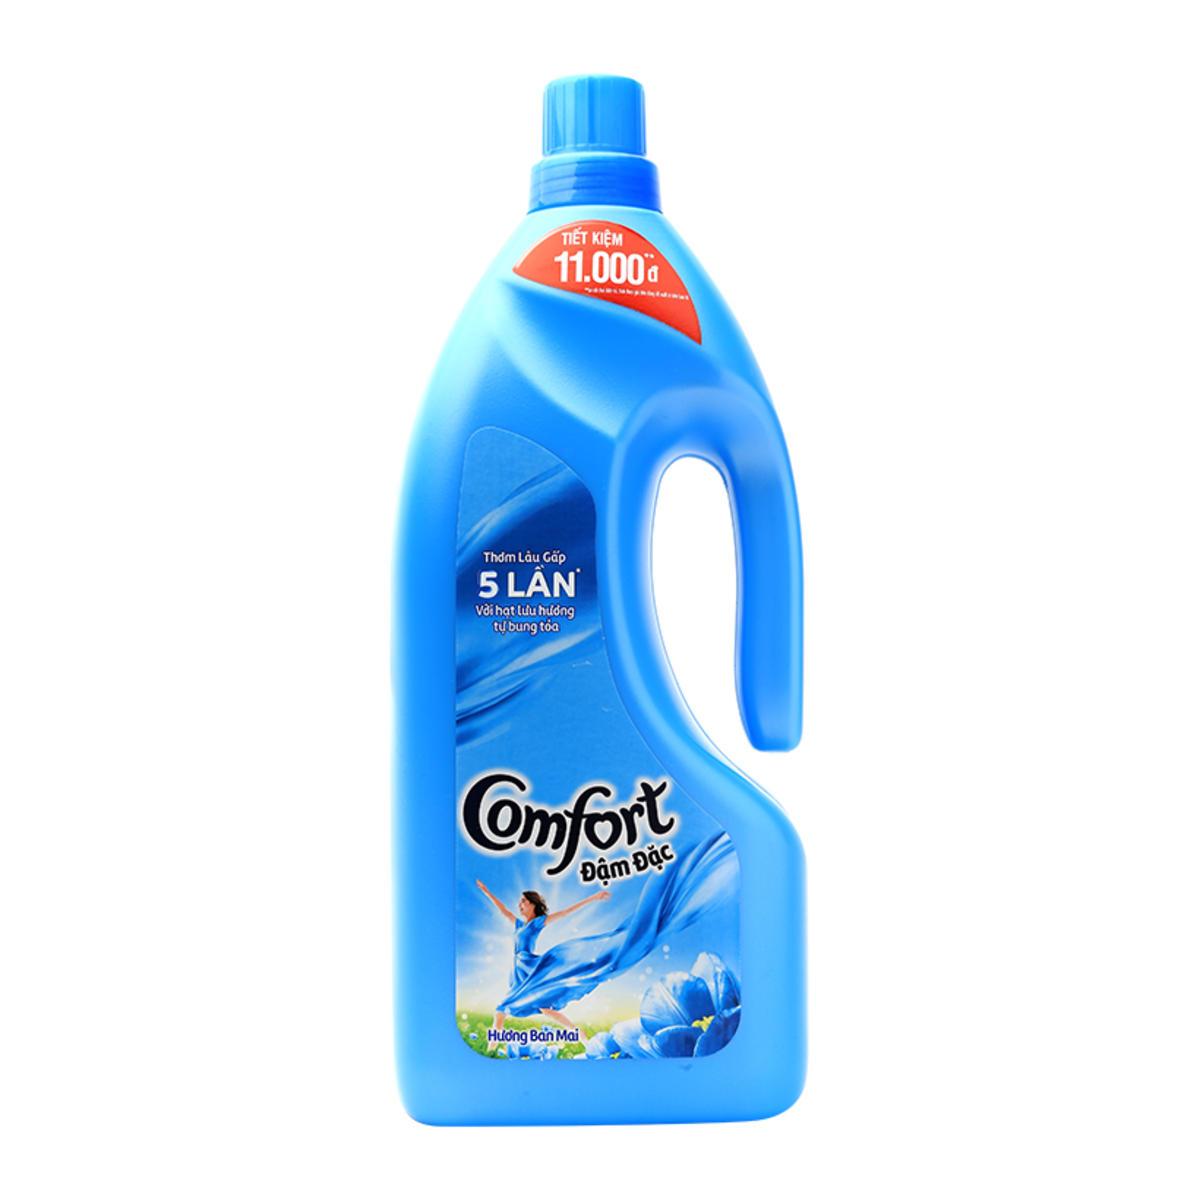 comfort-morning-fresh-scent-fabric-softener-1-8l